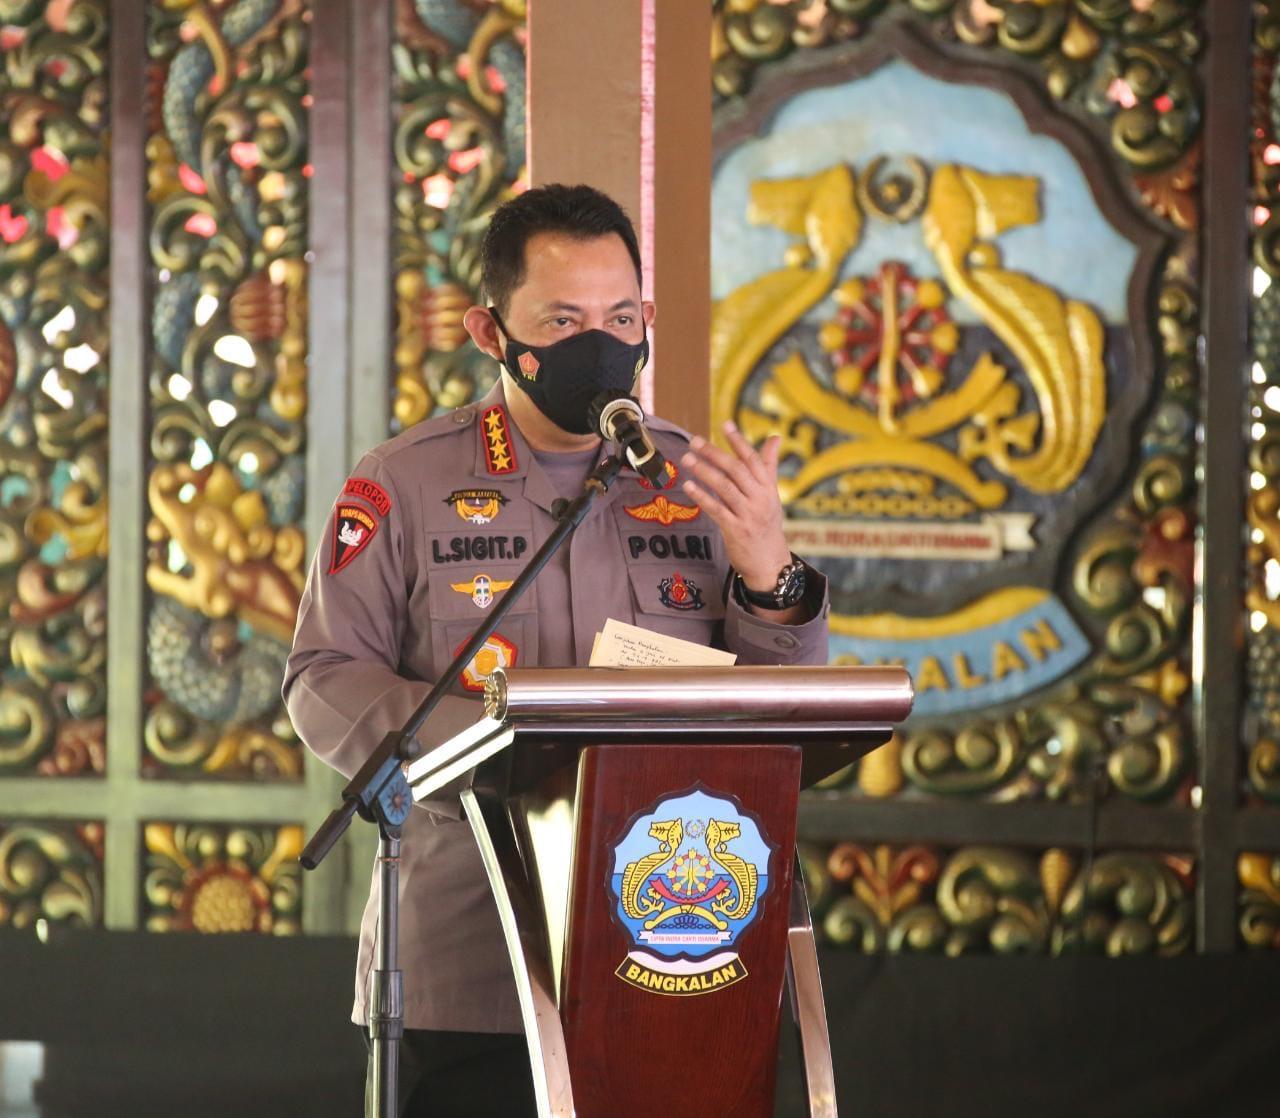 Panglima TNI dan Kapolri Ajak Tokoh Agama Bangkalan, Bantu Cegah Penyebaran Covid-19